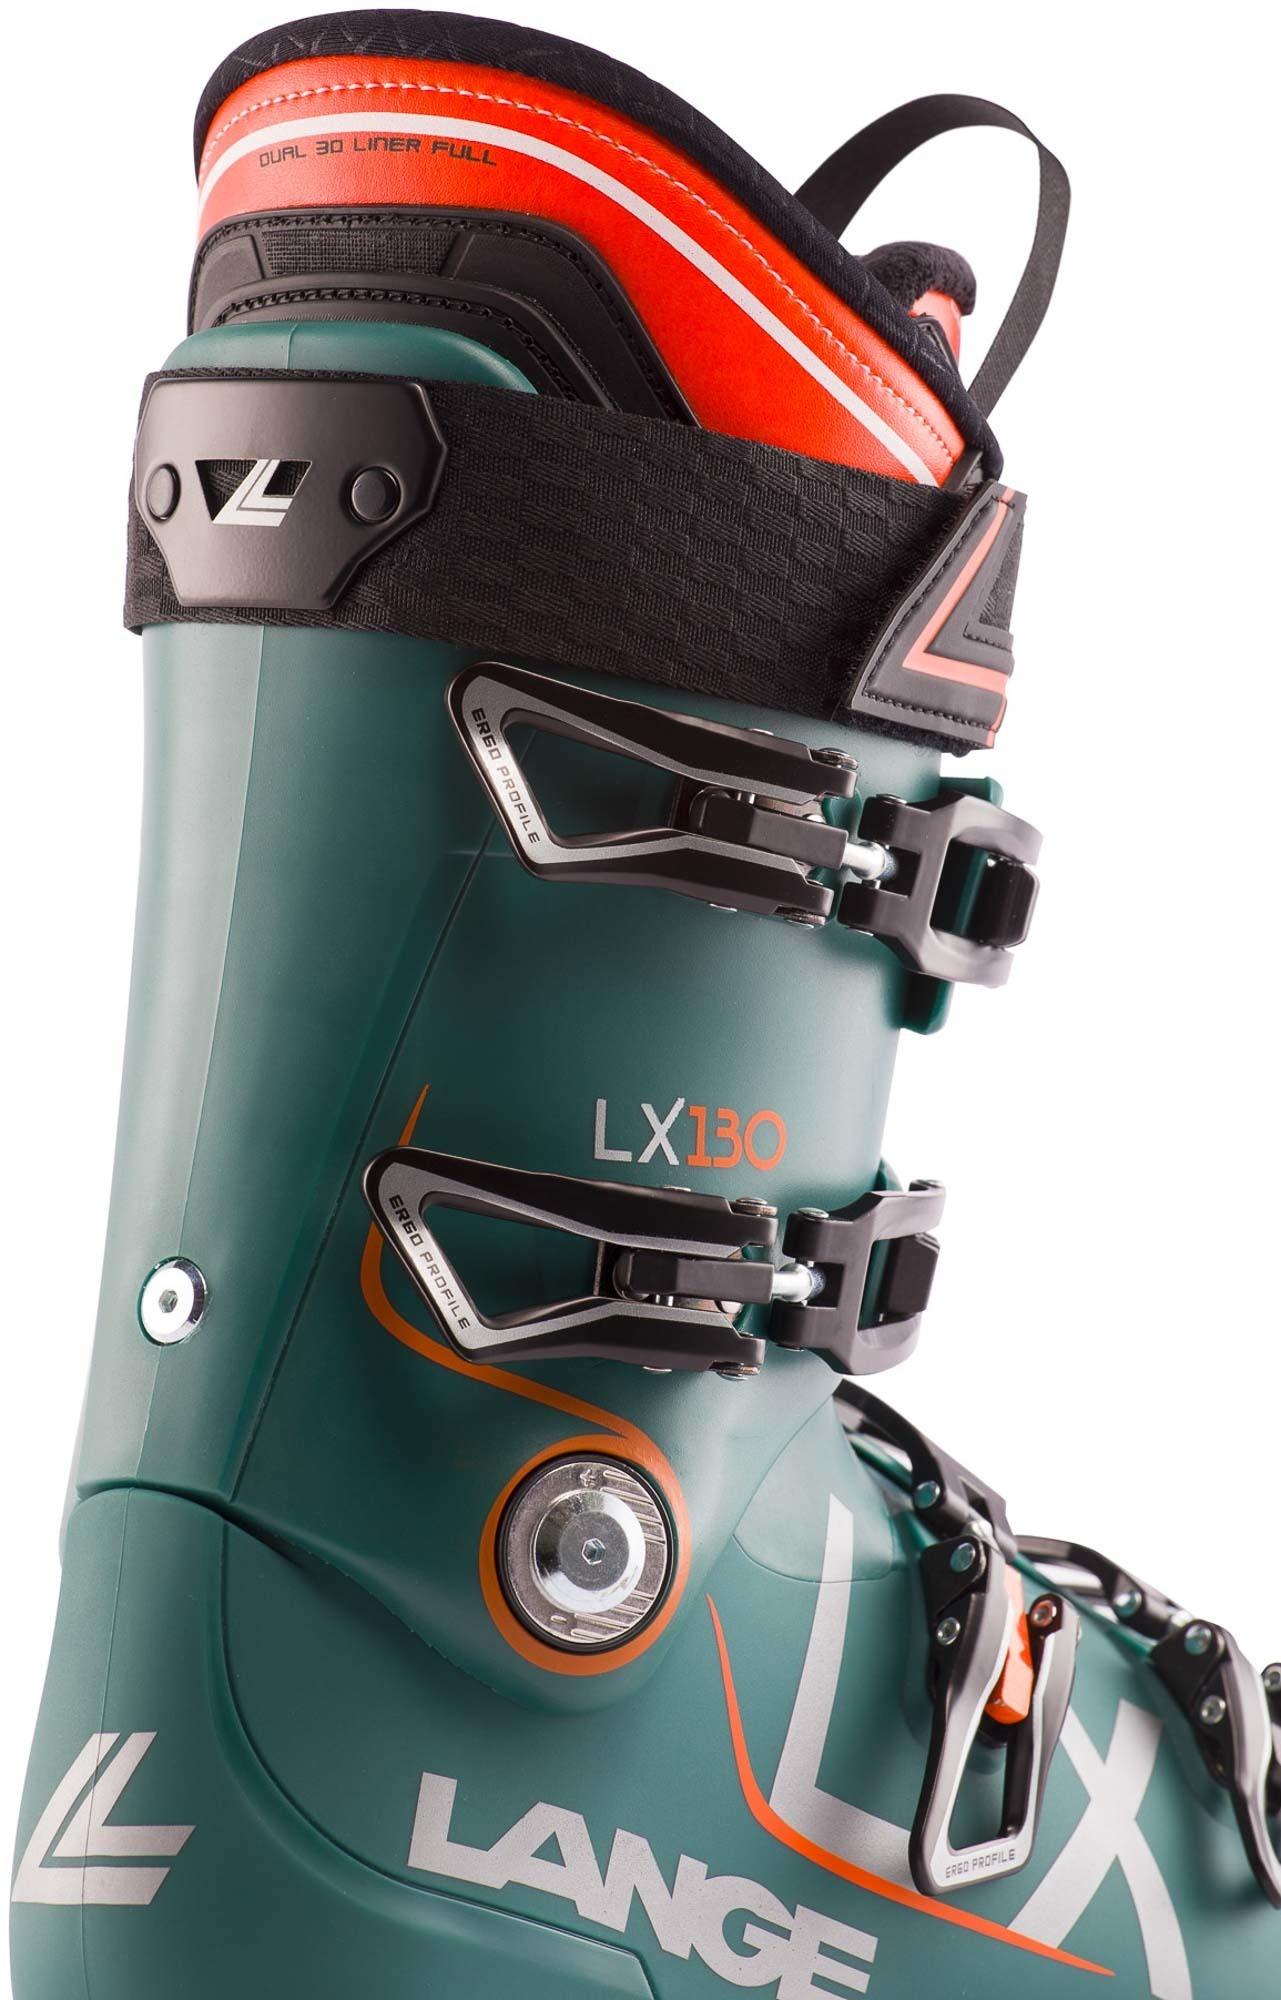 LX 130-5